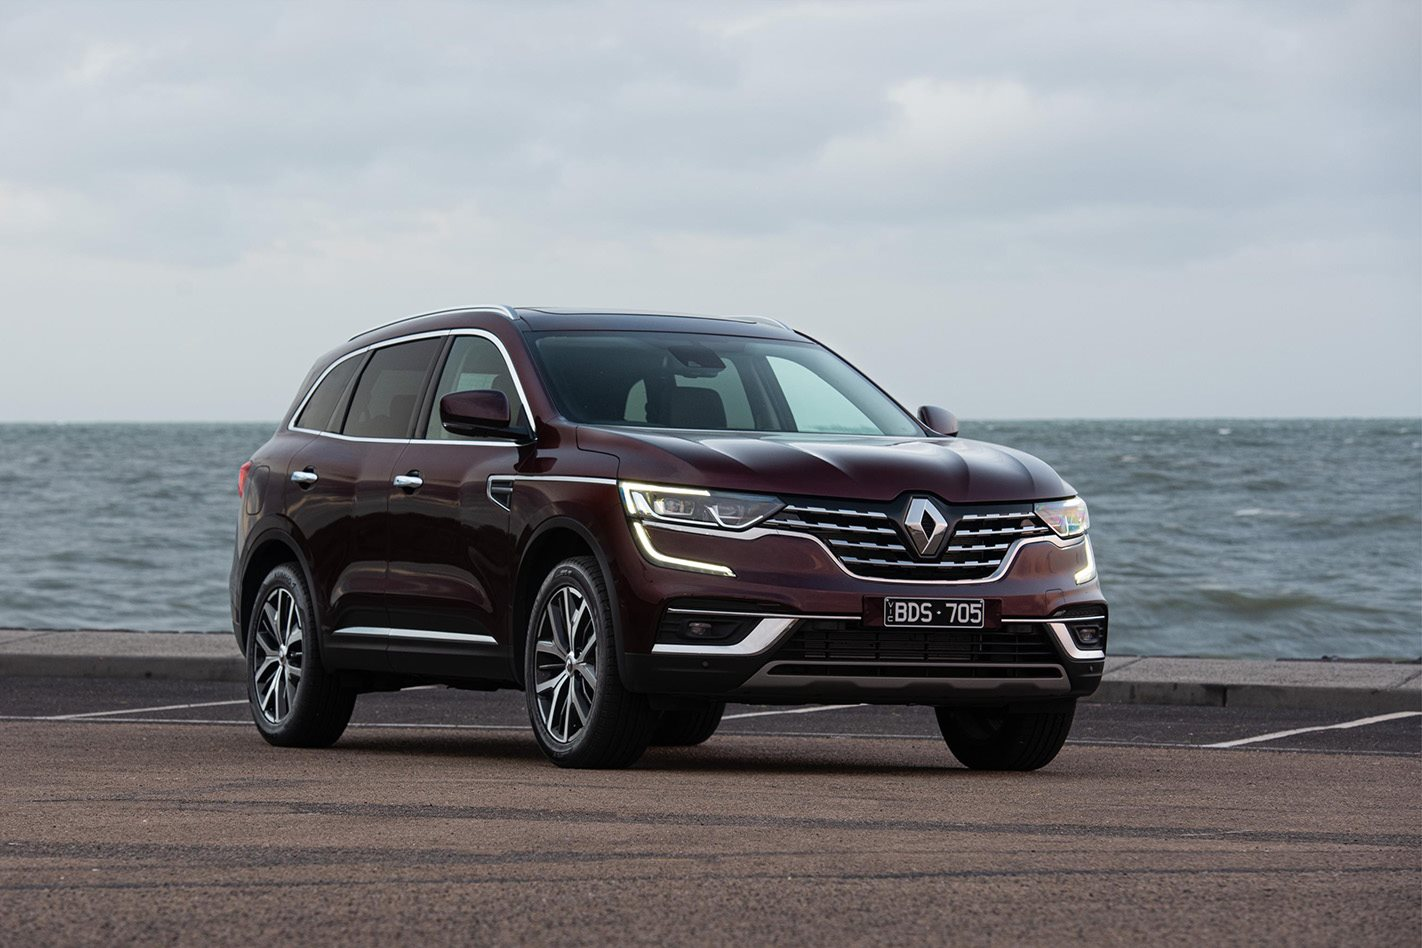 2020 Renault Koleos Gains Minor Facelift